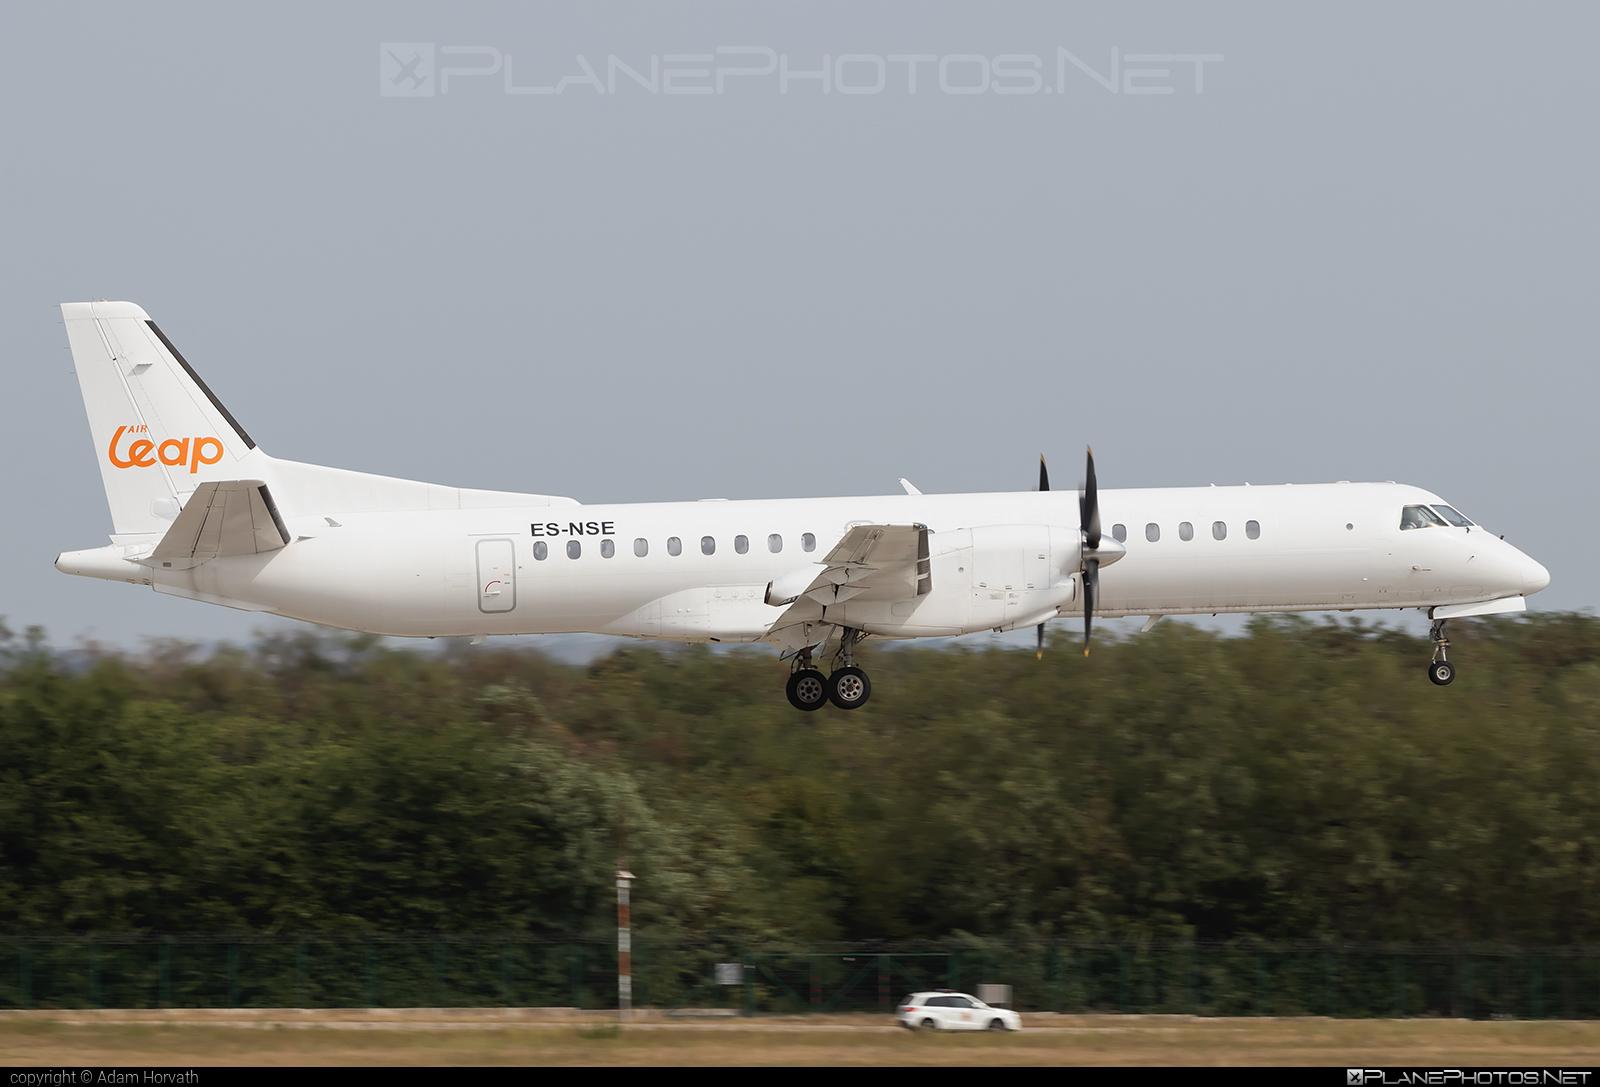 Saab 2000 - ES-NSE operated by Air Leap #airleap #saab